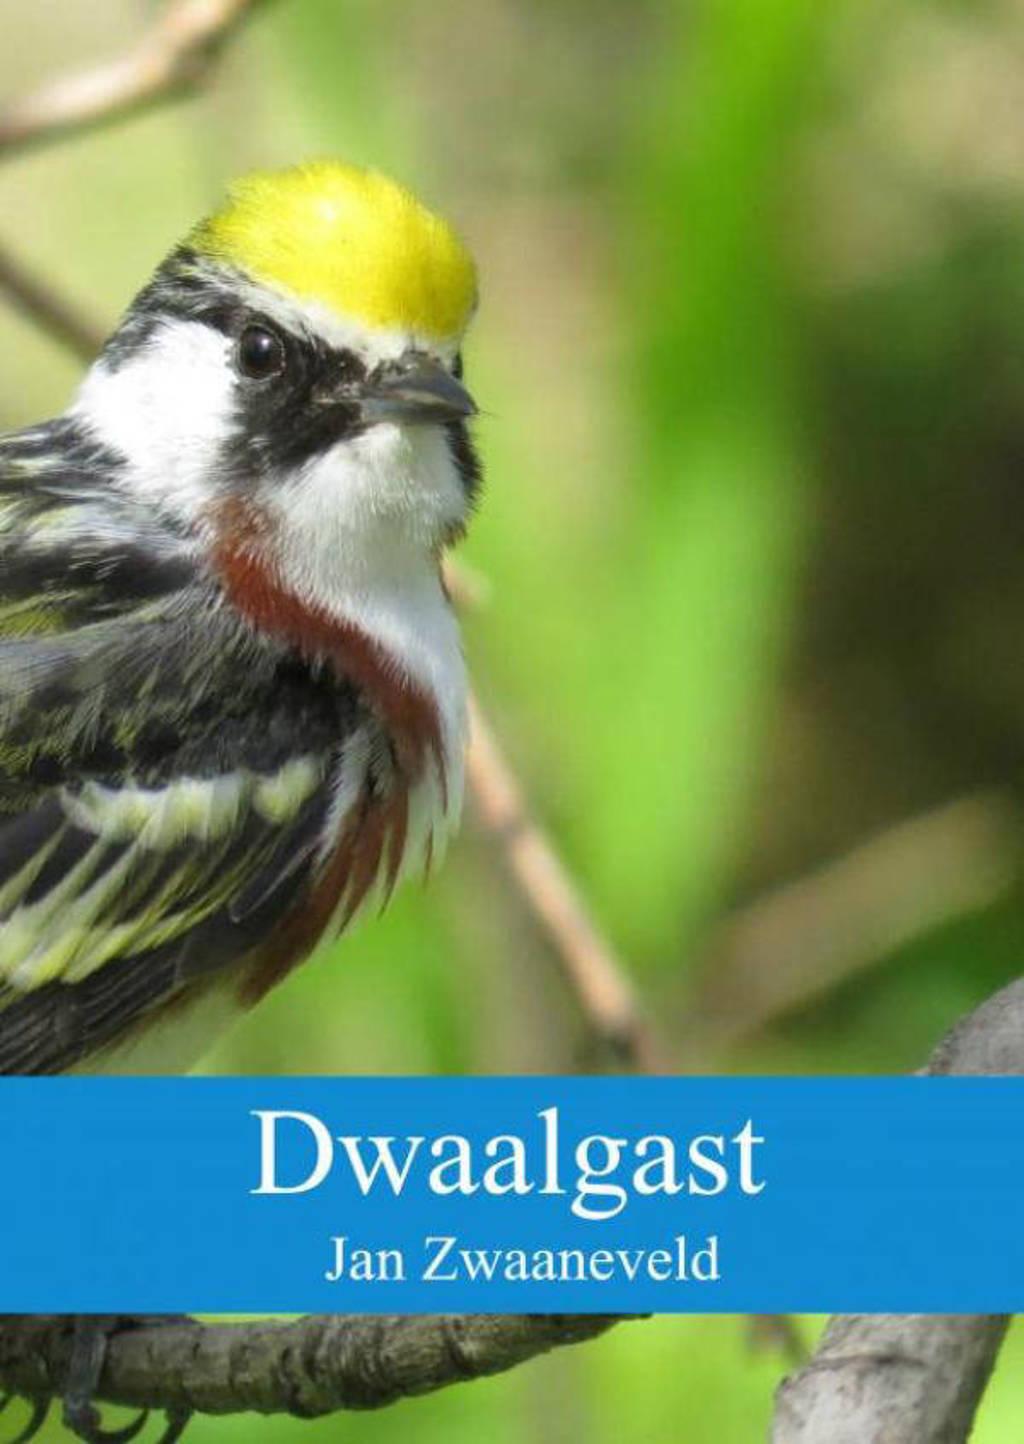 Dwaalgast - Jan Zwaaneveld